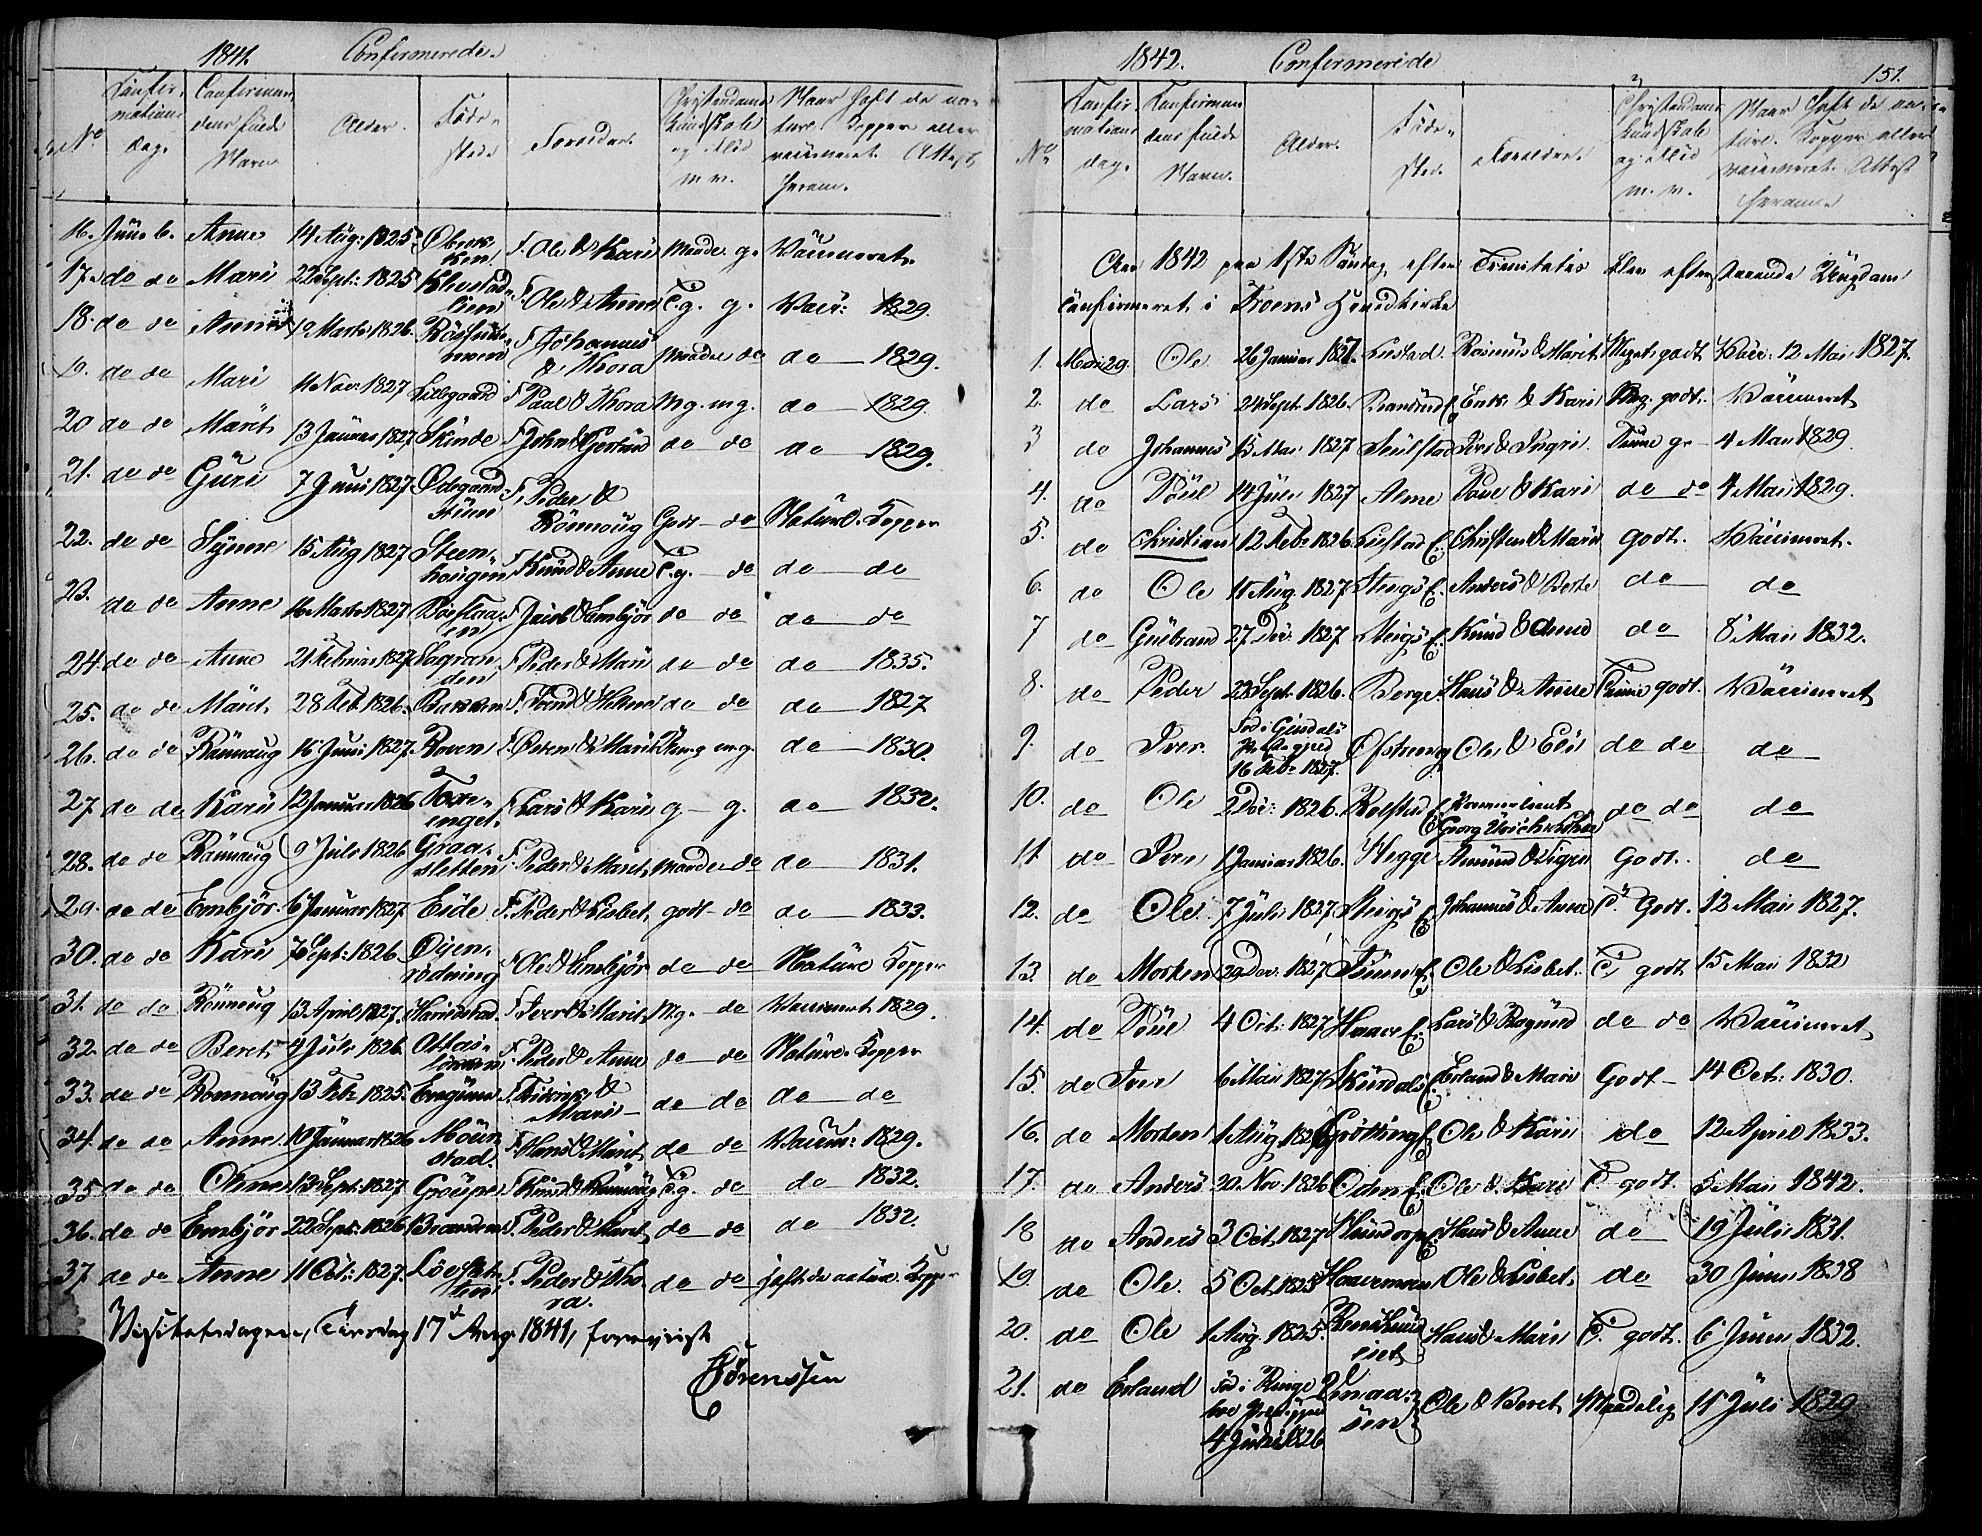 SAH, Fron prestekontor, H/Ha/Haa/L0004: Ministerialbok nr. 4, 1839-1848, s. 151